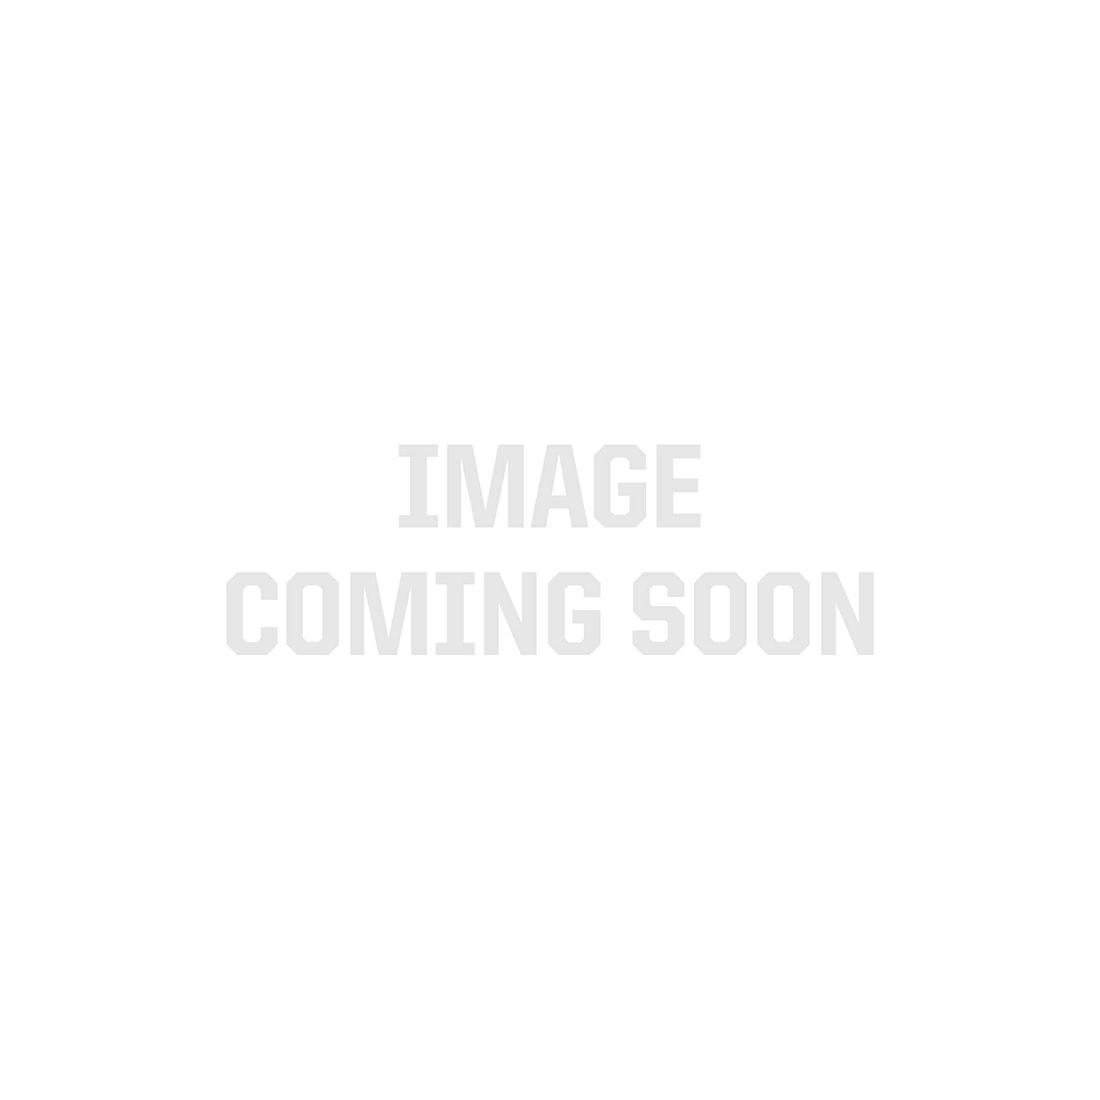 S14 Clear Glass Dimmable LED Light Bulb, E26 (Medium) Base, 1.4 watt (Very Warm White)